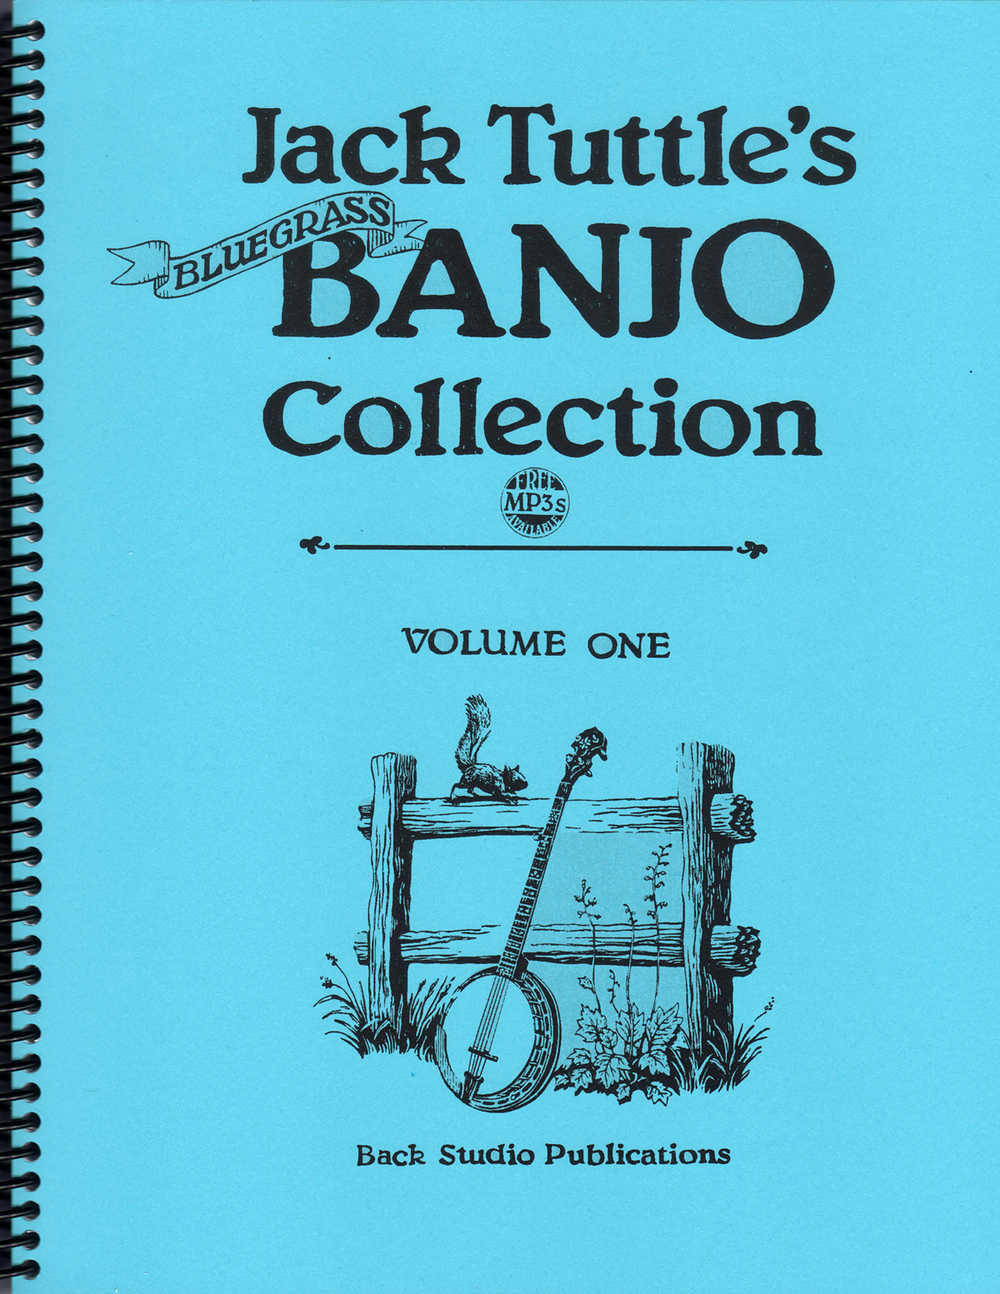 Jack Tuttle's Bluegrass Banjo Collection, Vol. 1